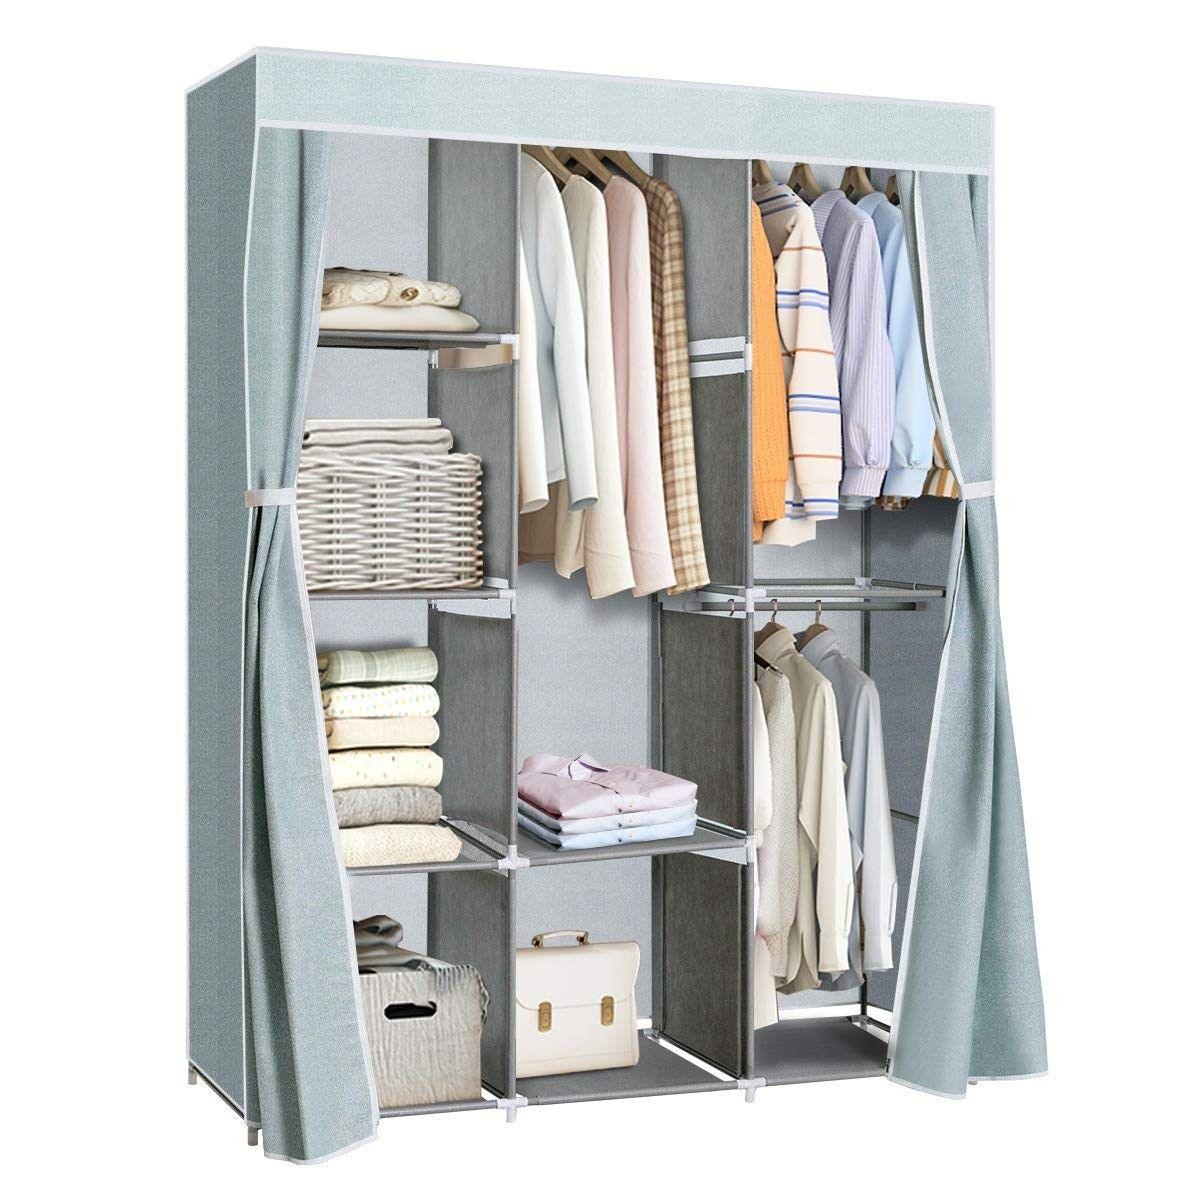 Portable Clothes Closet Storage Organizer Clothes Rack 36 95 Free Shippi Closet Clothes Storage Storage Closet Organization Closet Storage Systems